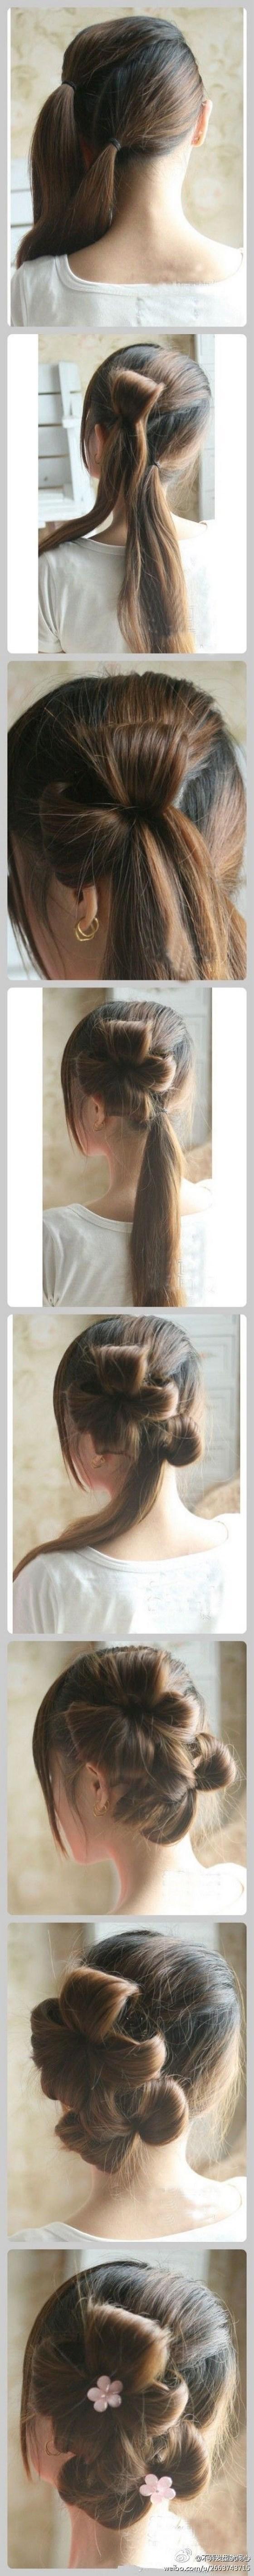 peinado recogido doble coleta